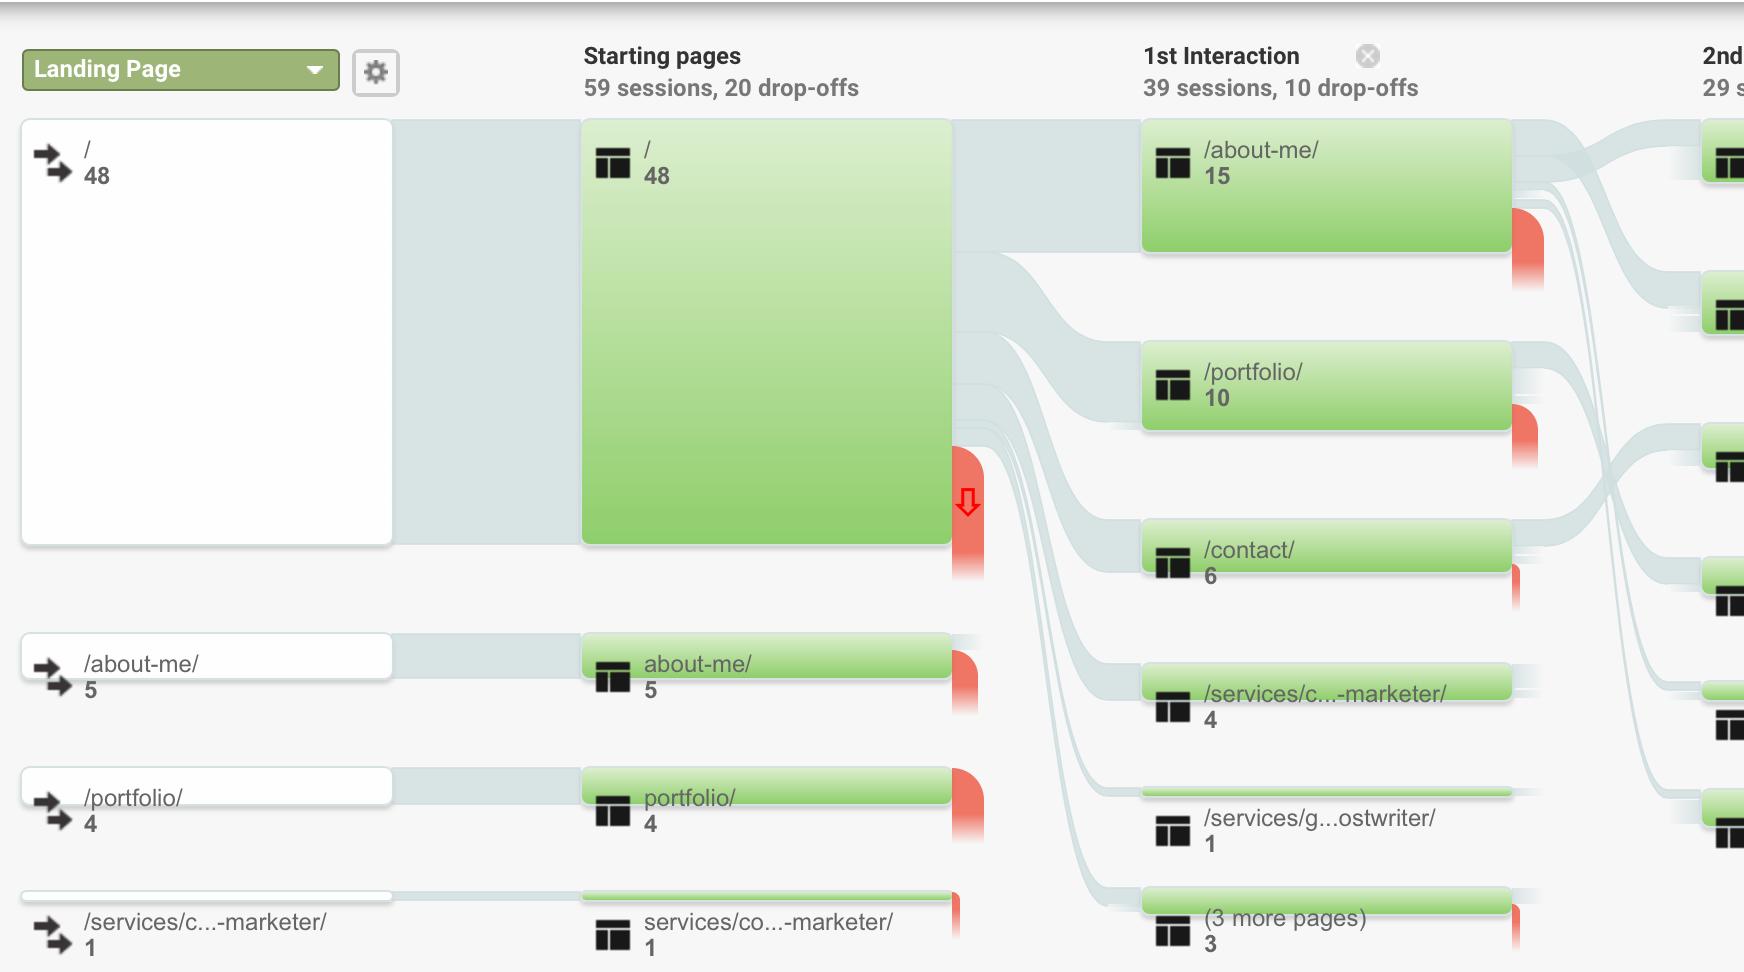 Google Analytics dashboard showing page performance metrics.